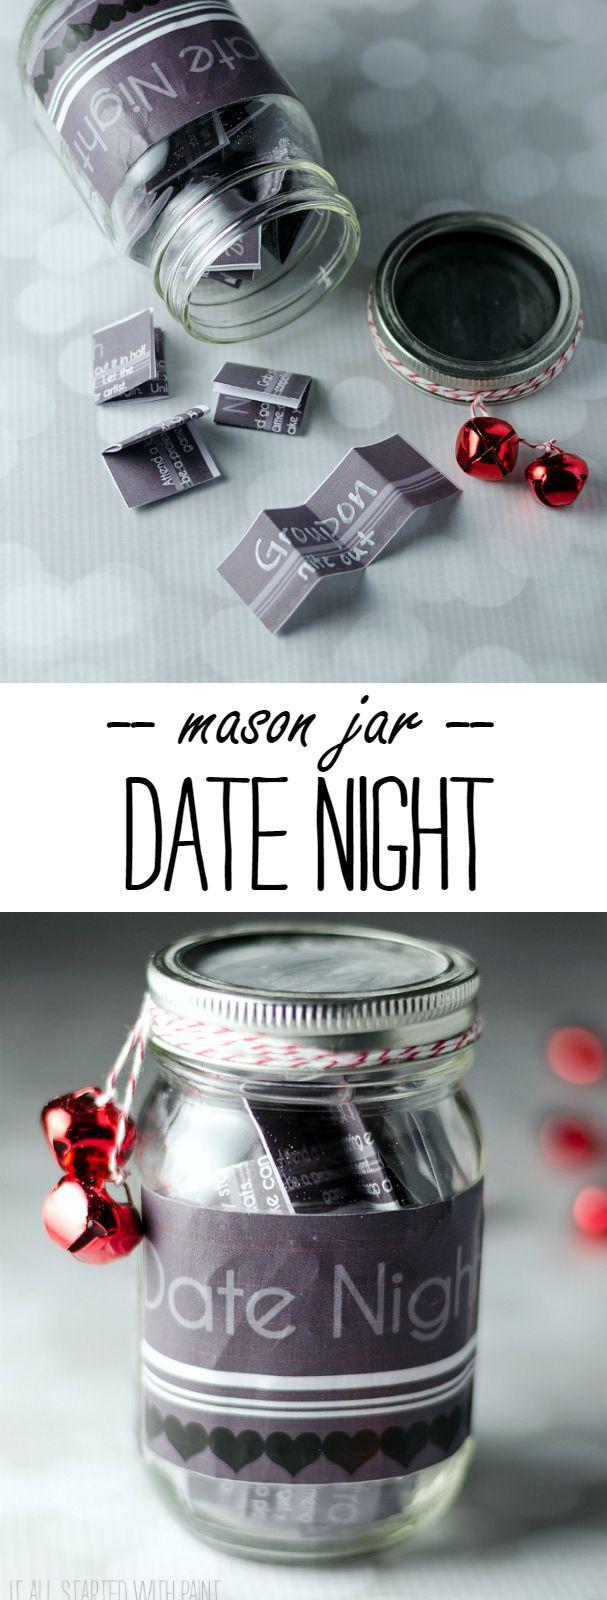 Mason Jar Craft Ideas - Date Night in Mason Jar Gift Idea - Mason Jar Gift Ideas